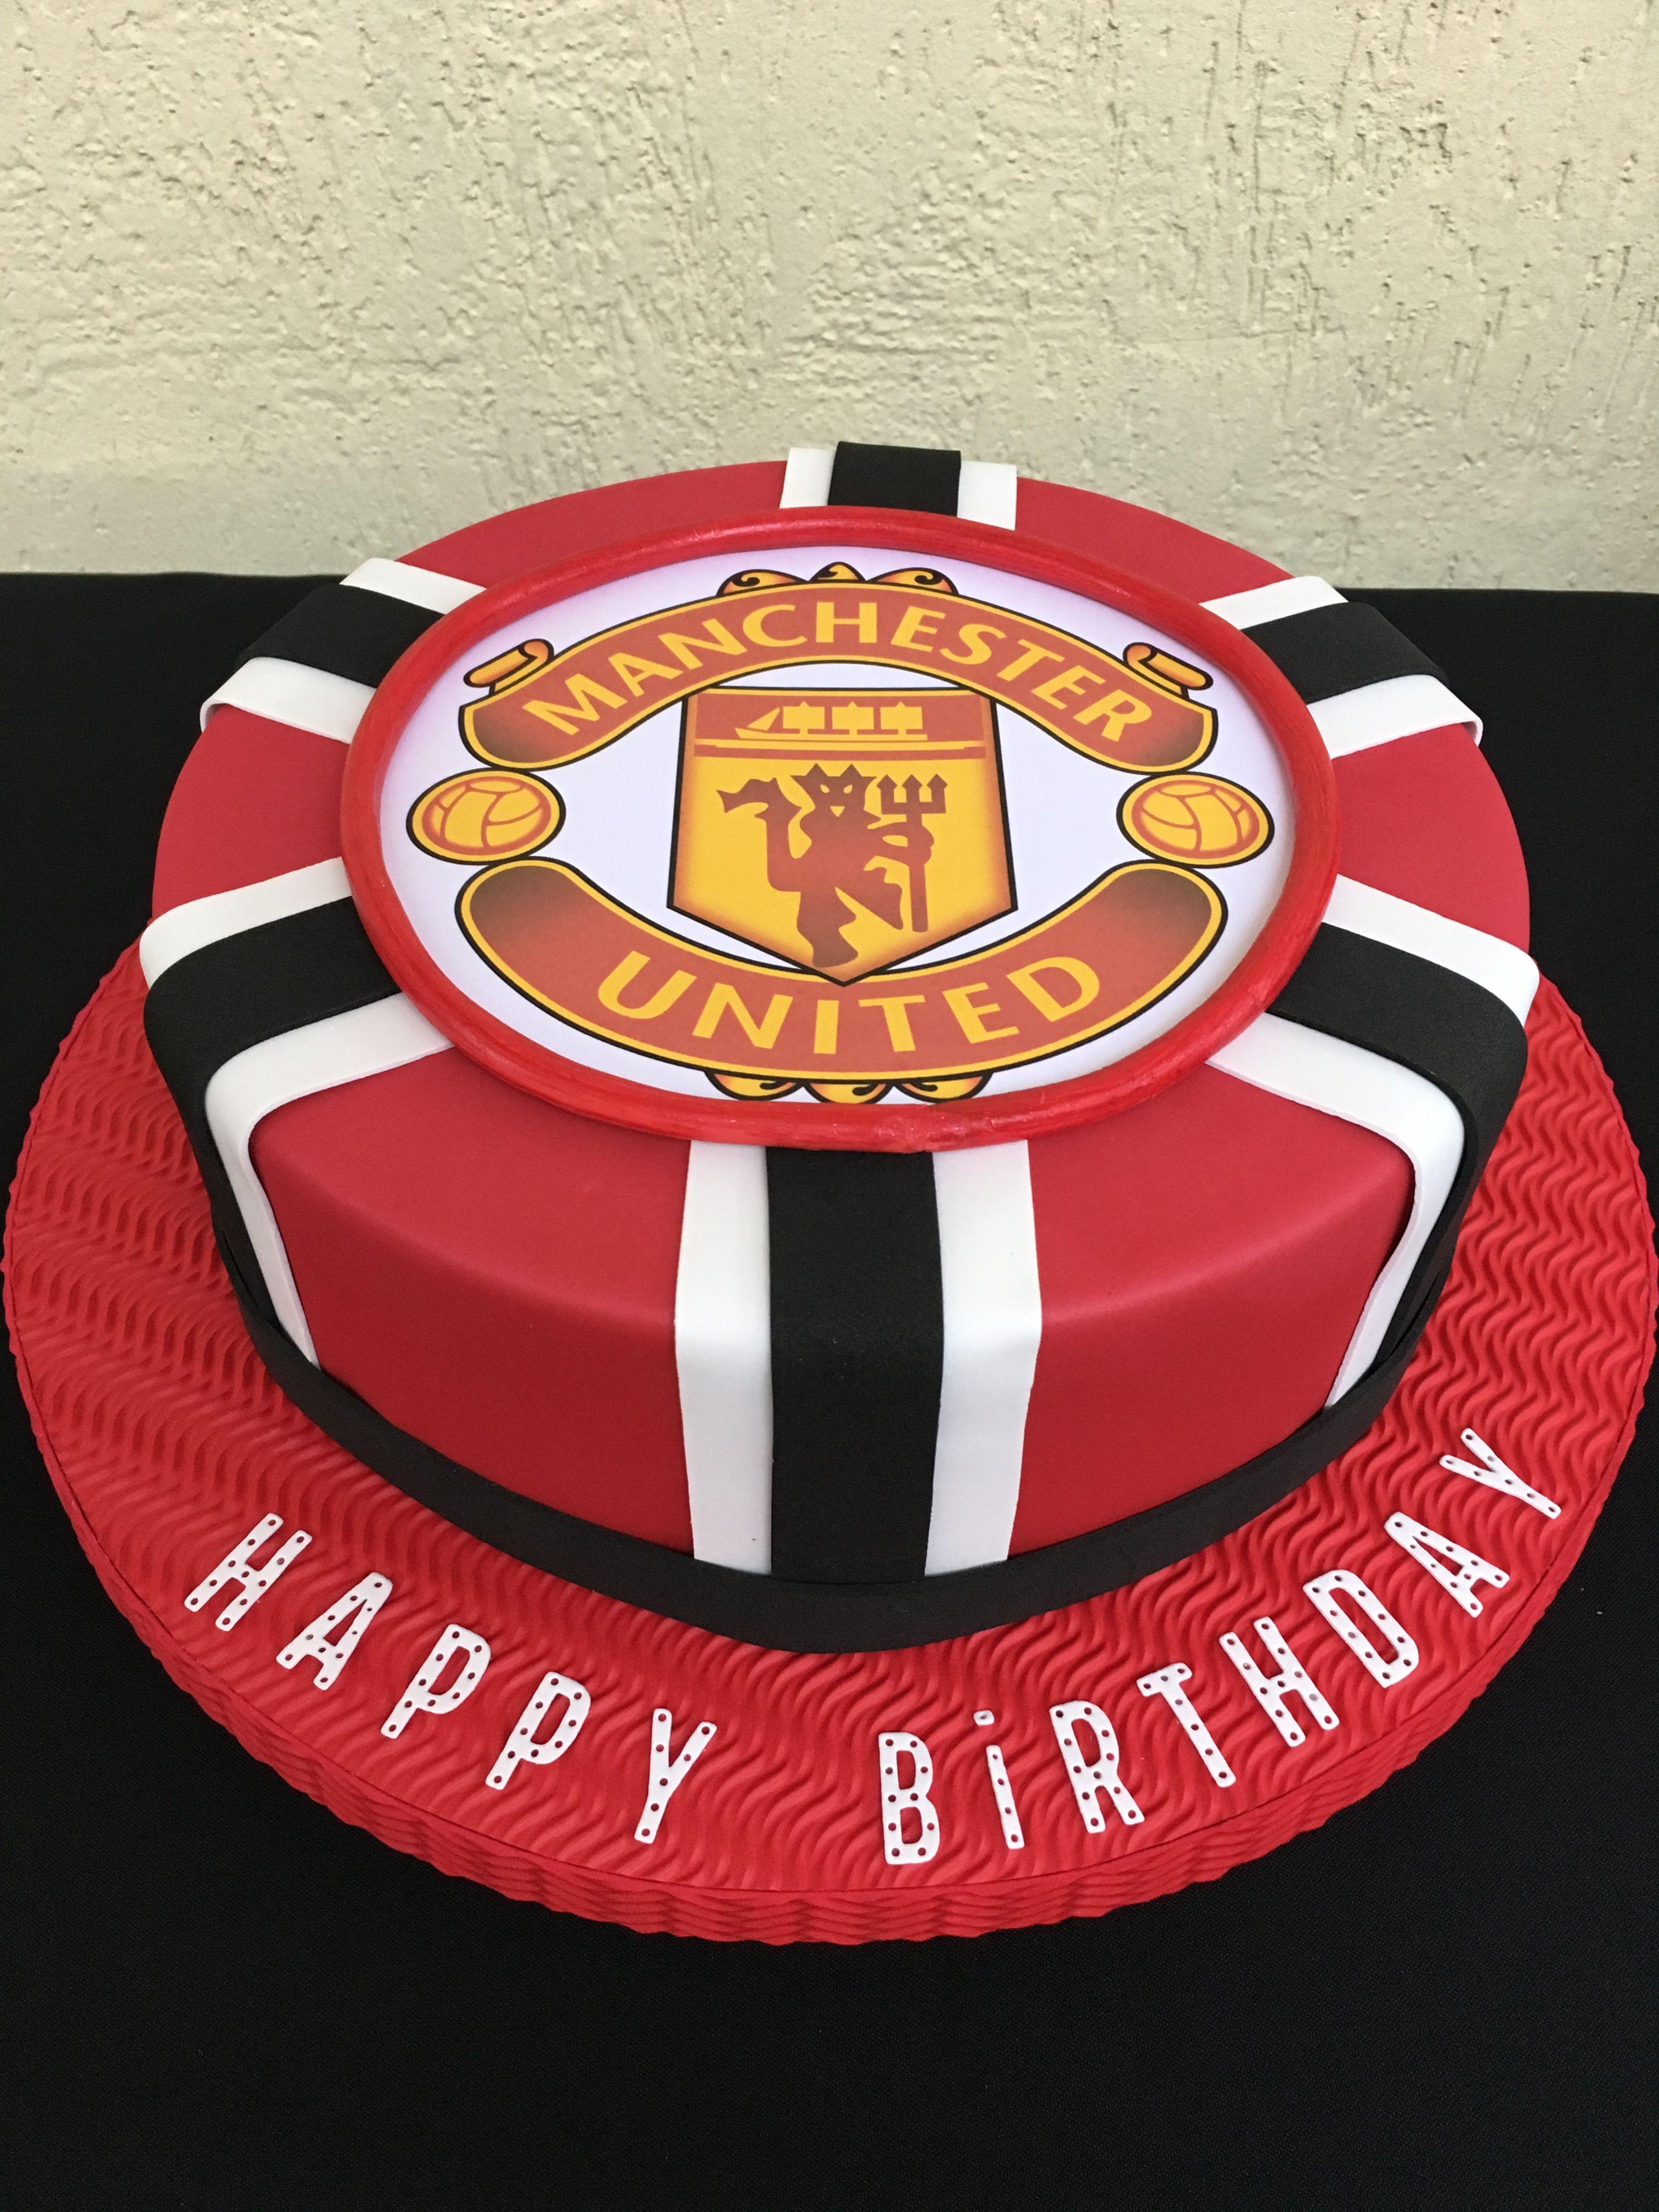 Excellent Torta Falsa Manchester United Manchester United Birthday Cake Birthday Cards Printable Nowaargucafe Filternl